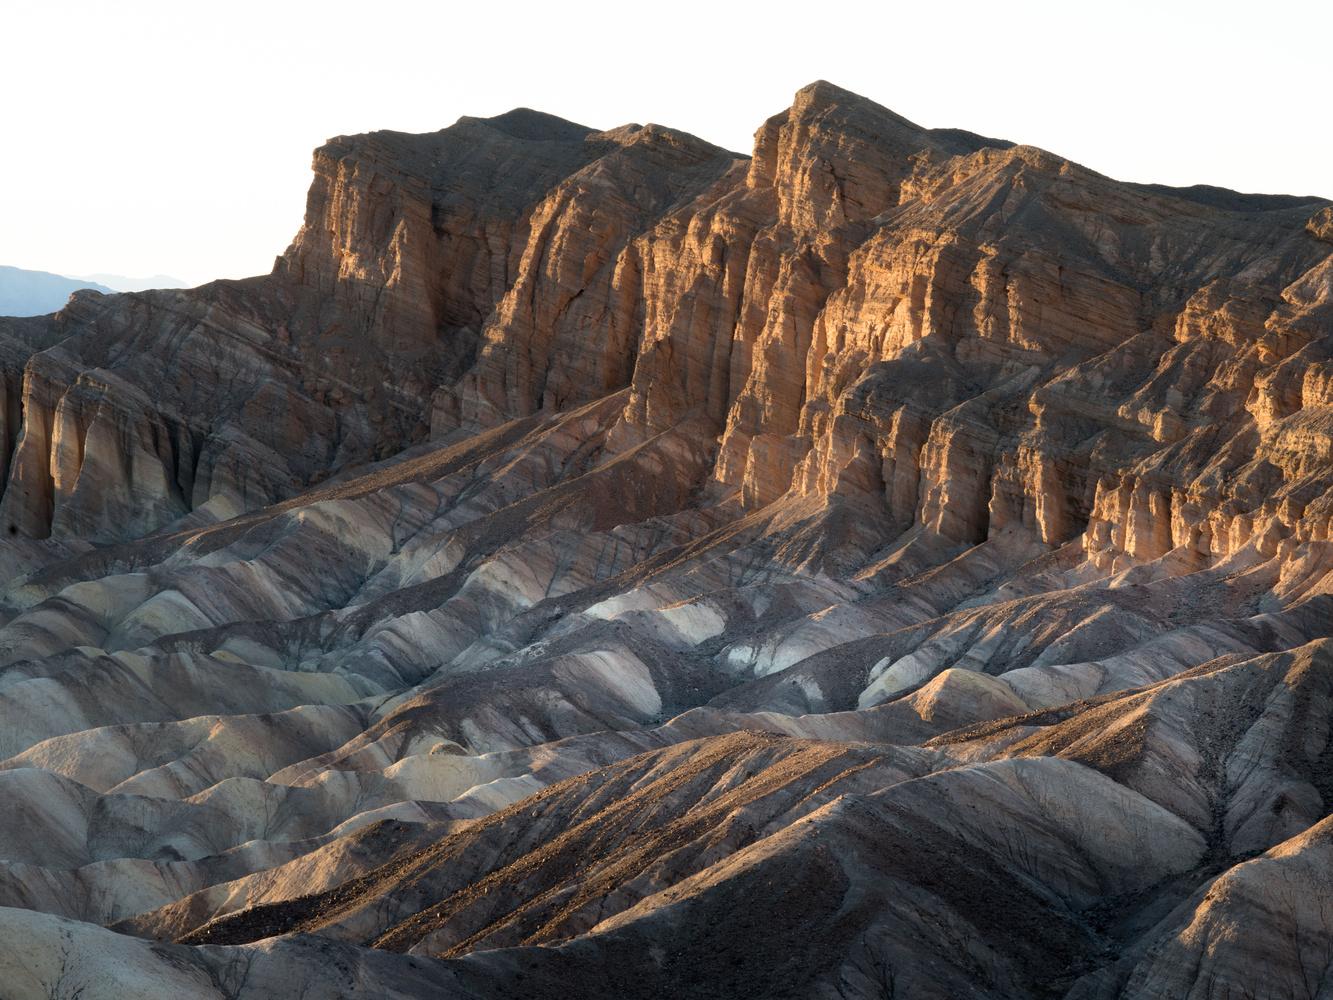 Badlands at Dusk by Taylor Noland